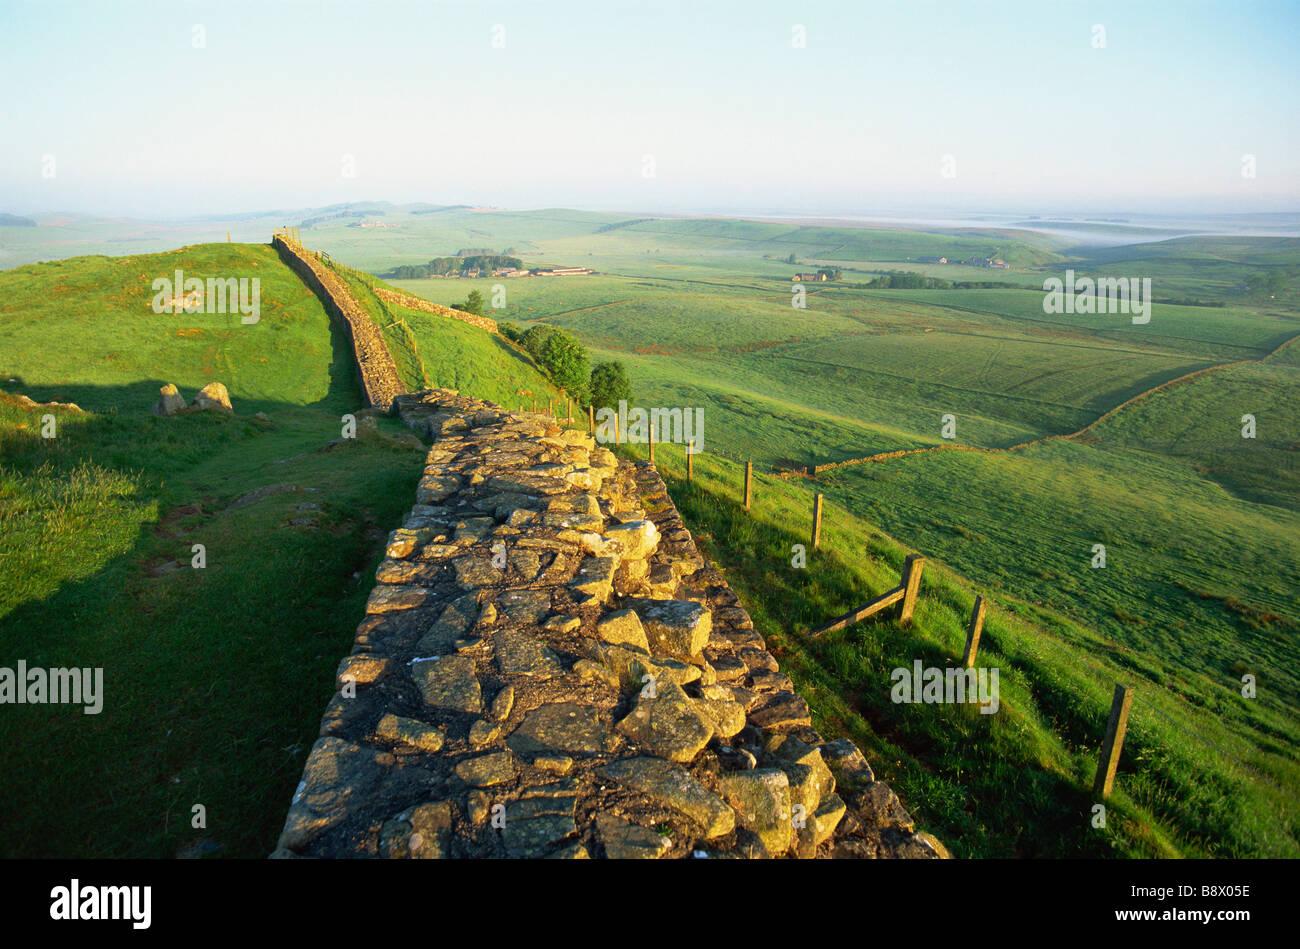 Kingdom of Northumbria - Wikipedia